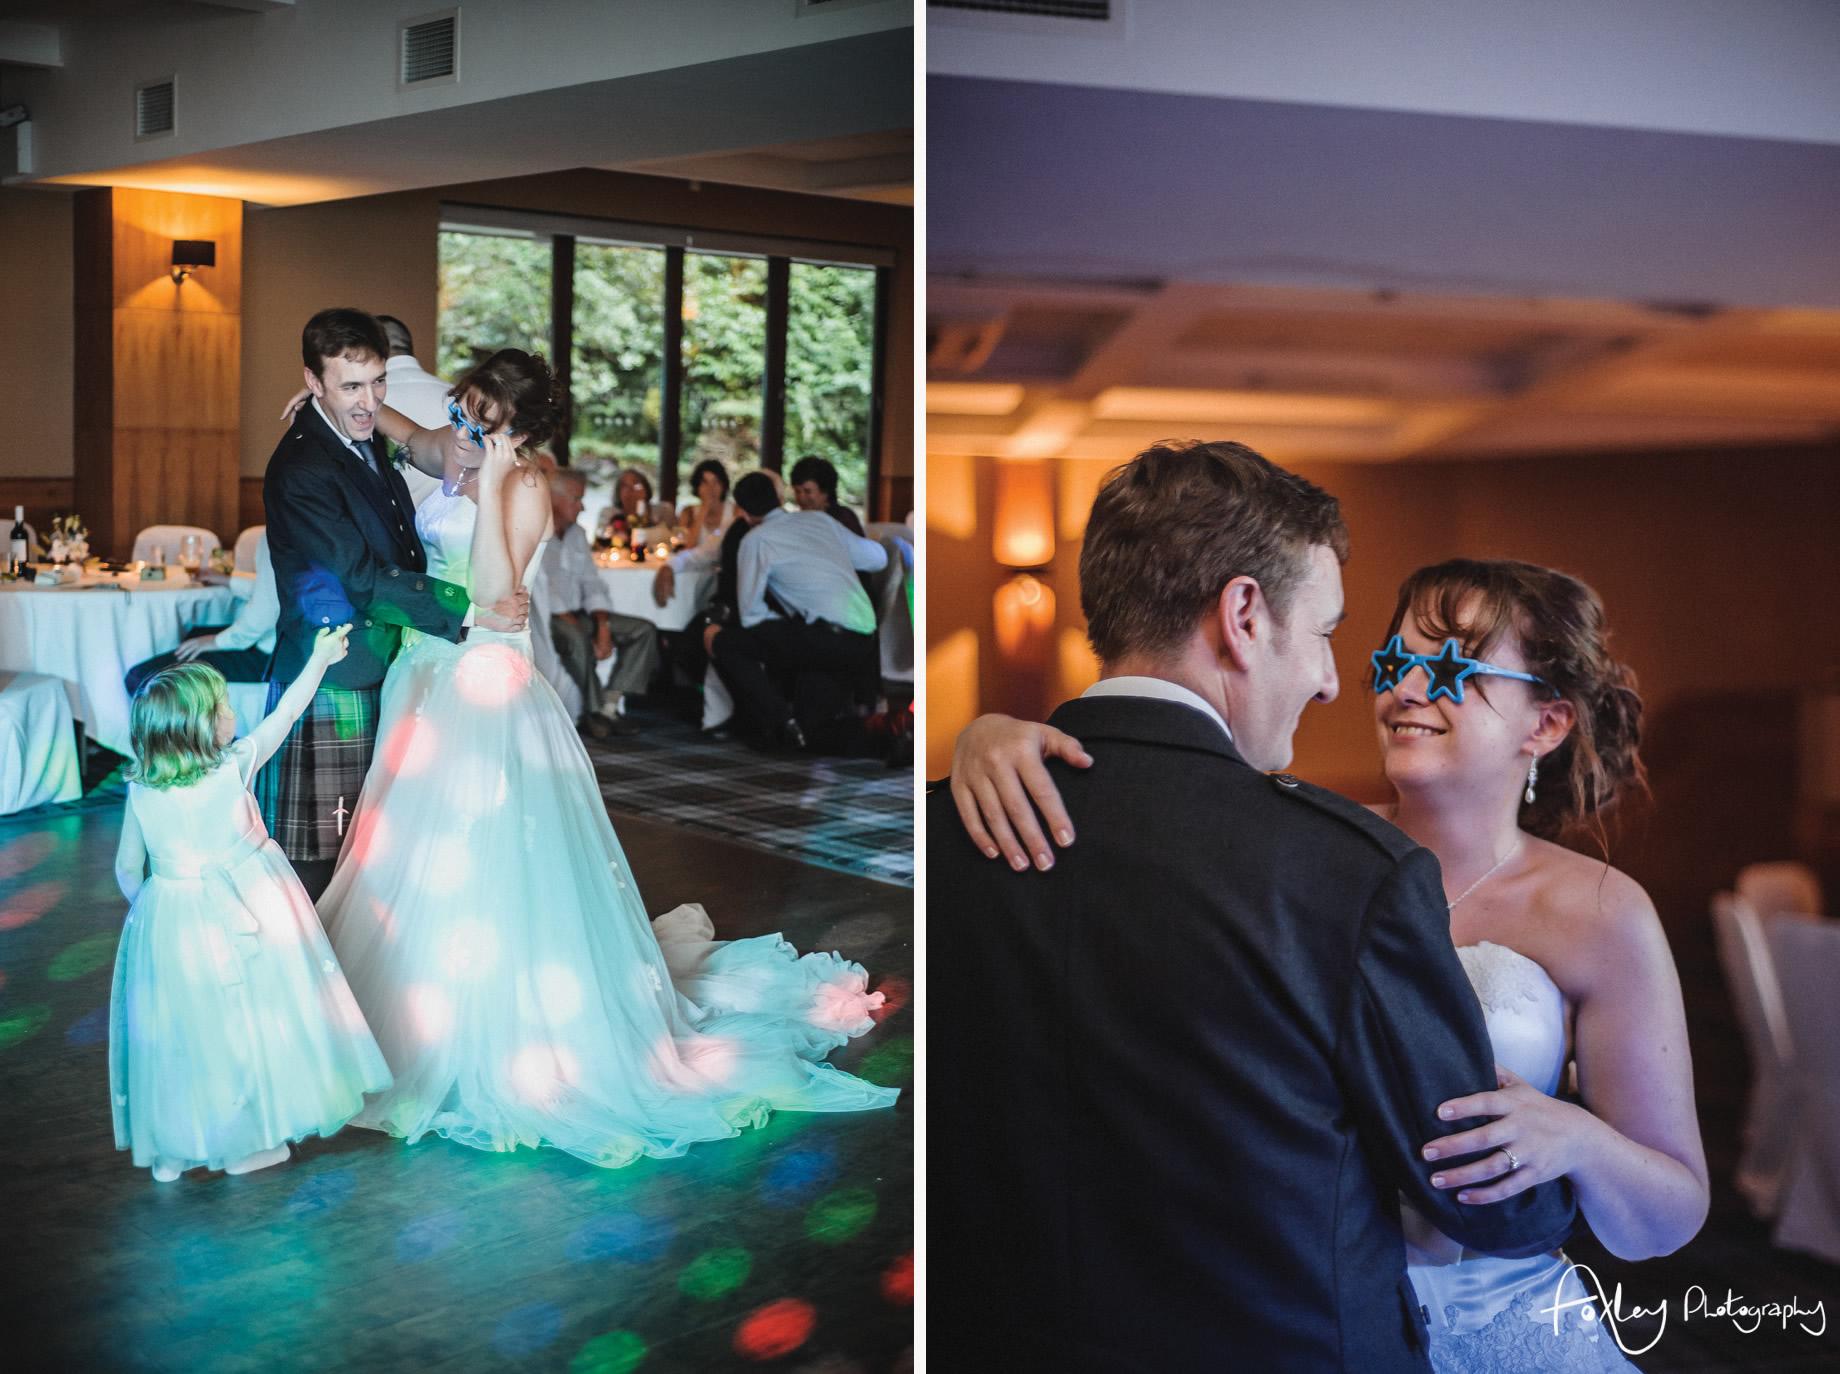 Alys-And-Davids-Wedding-Loch-Lomond-174